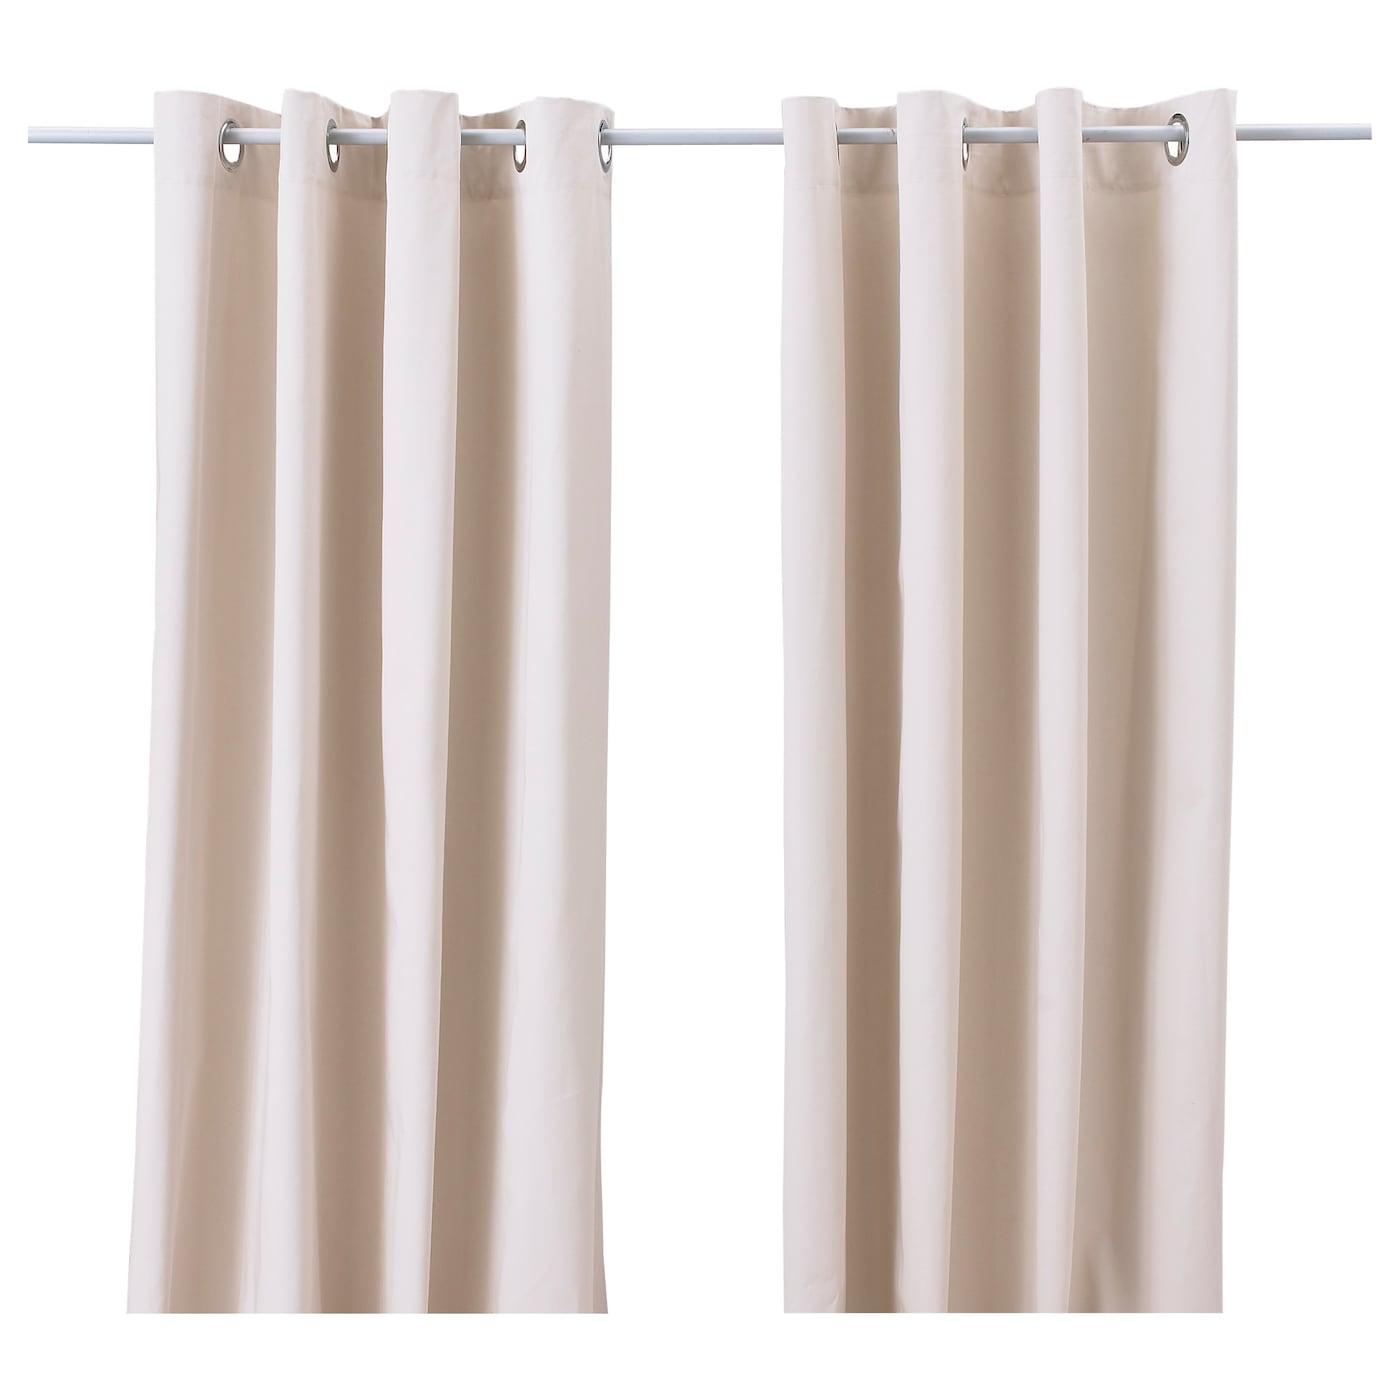 Lohals alfombra natural 160 x 230 cm ikea - Antideslizante alfombras ikea ...